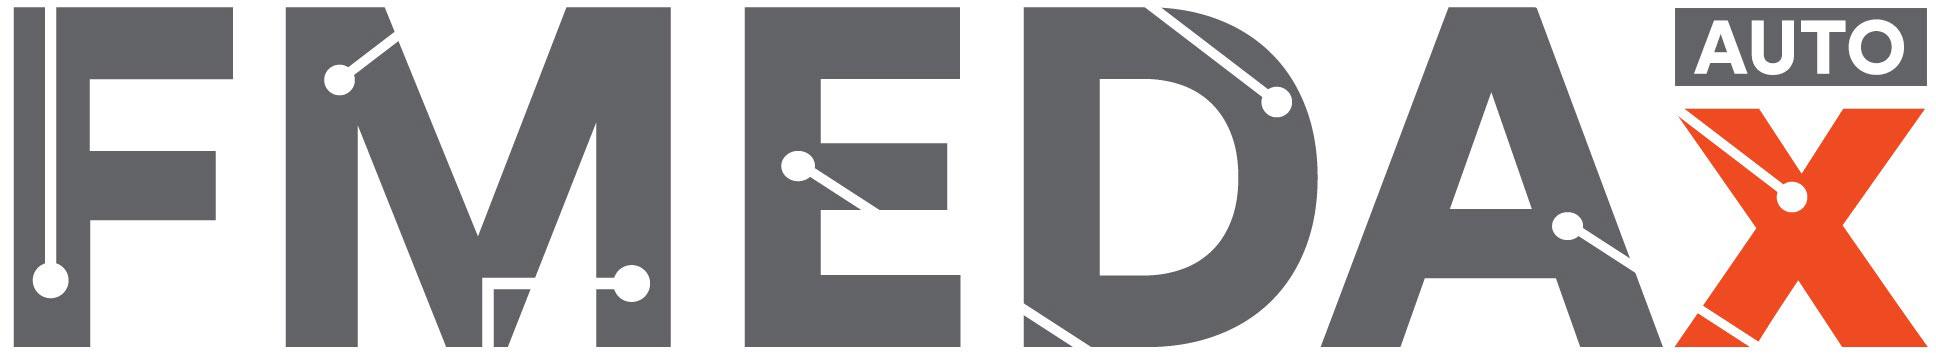 FMEDAx Auto